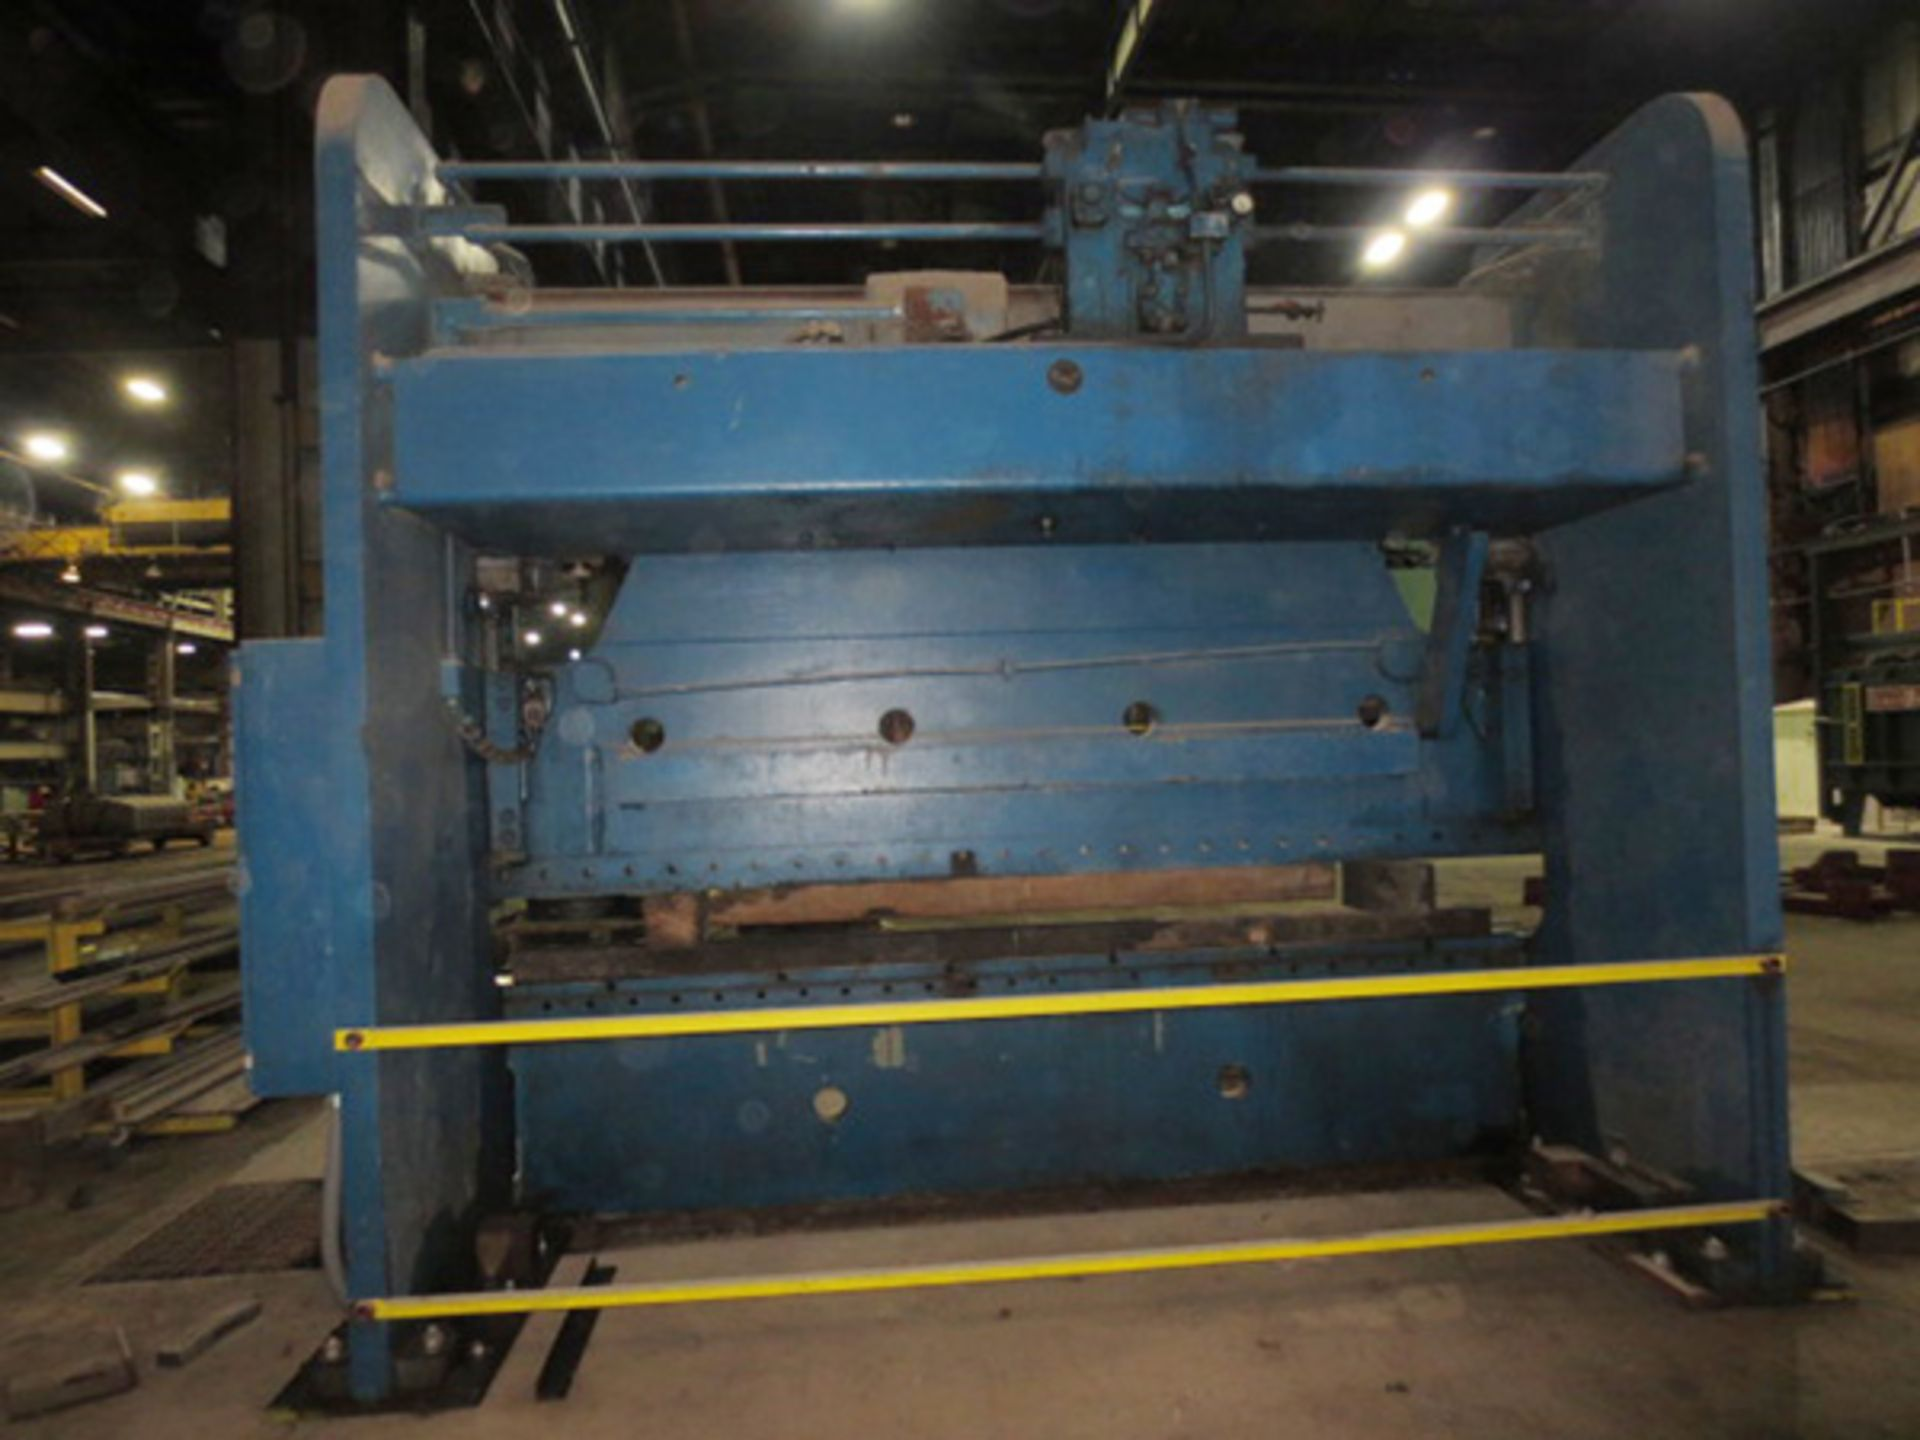 Lot 35B - Cincinnati Hydraulic Press Brake | 400-Ton x 16', Mdl: 400H x 12, S/N: 36959, Located In: